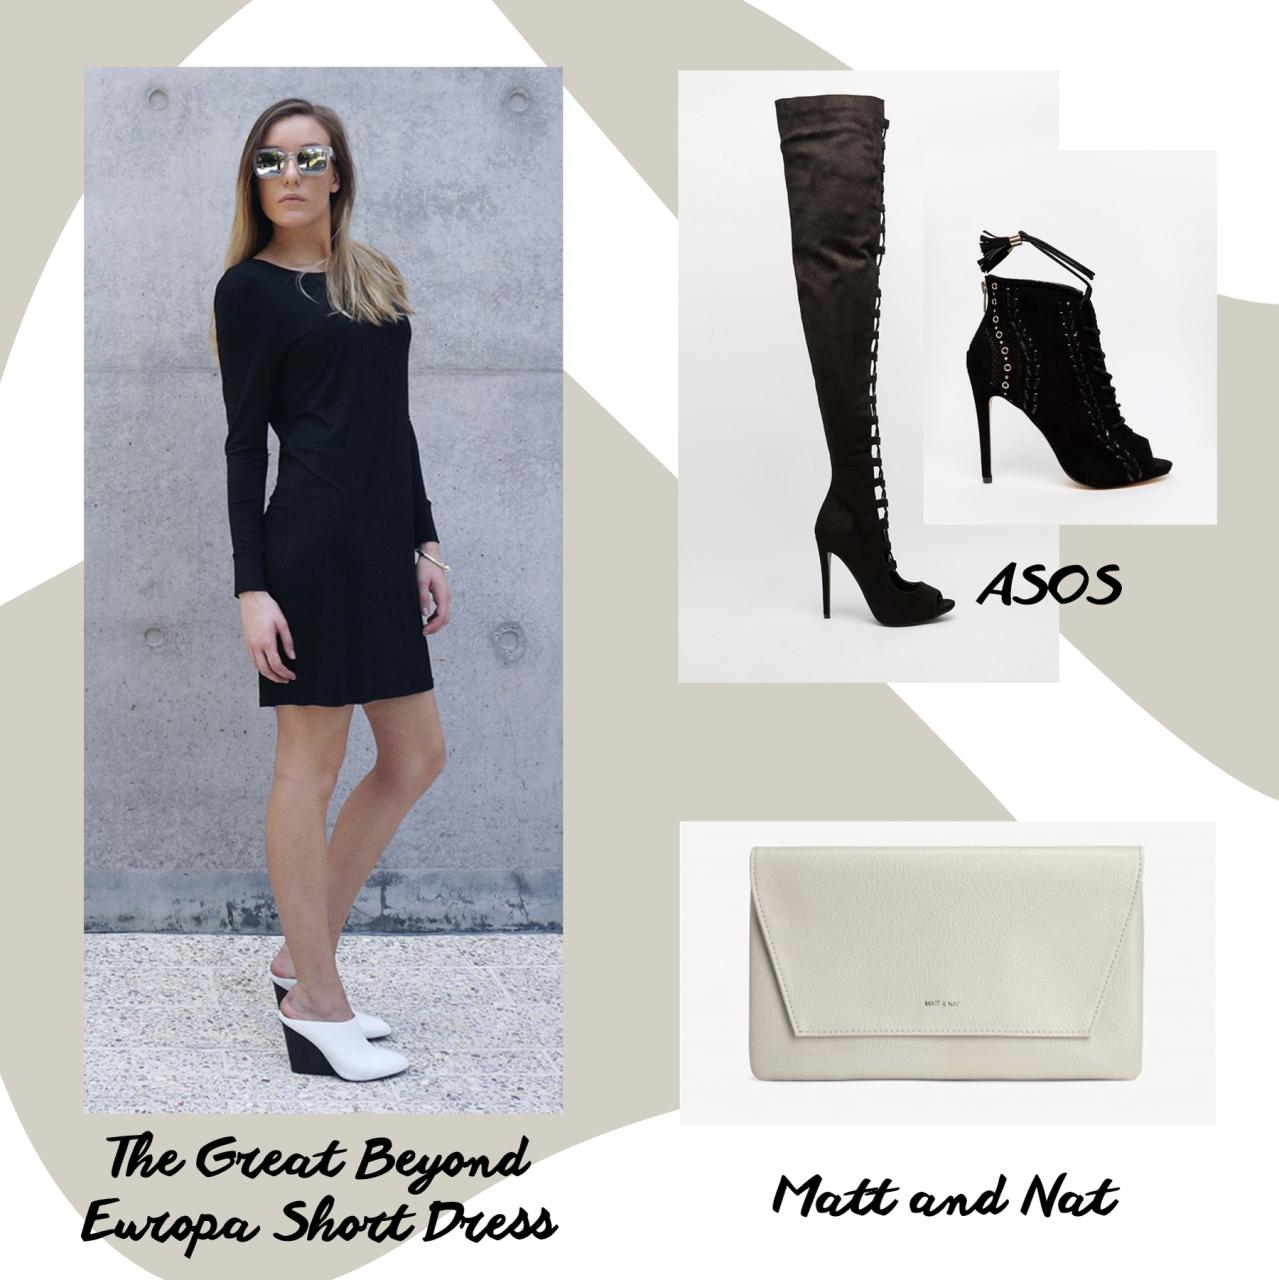 style-file-europa-short-dress-matt-and-nat-asos-eco-fashion-vegan-fashion